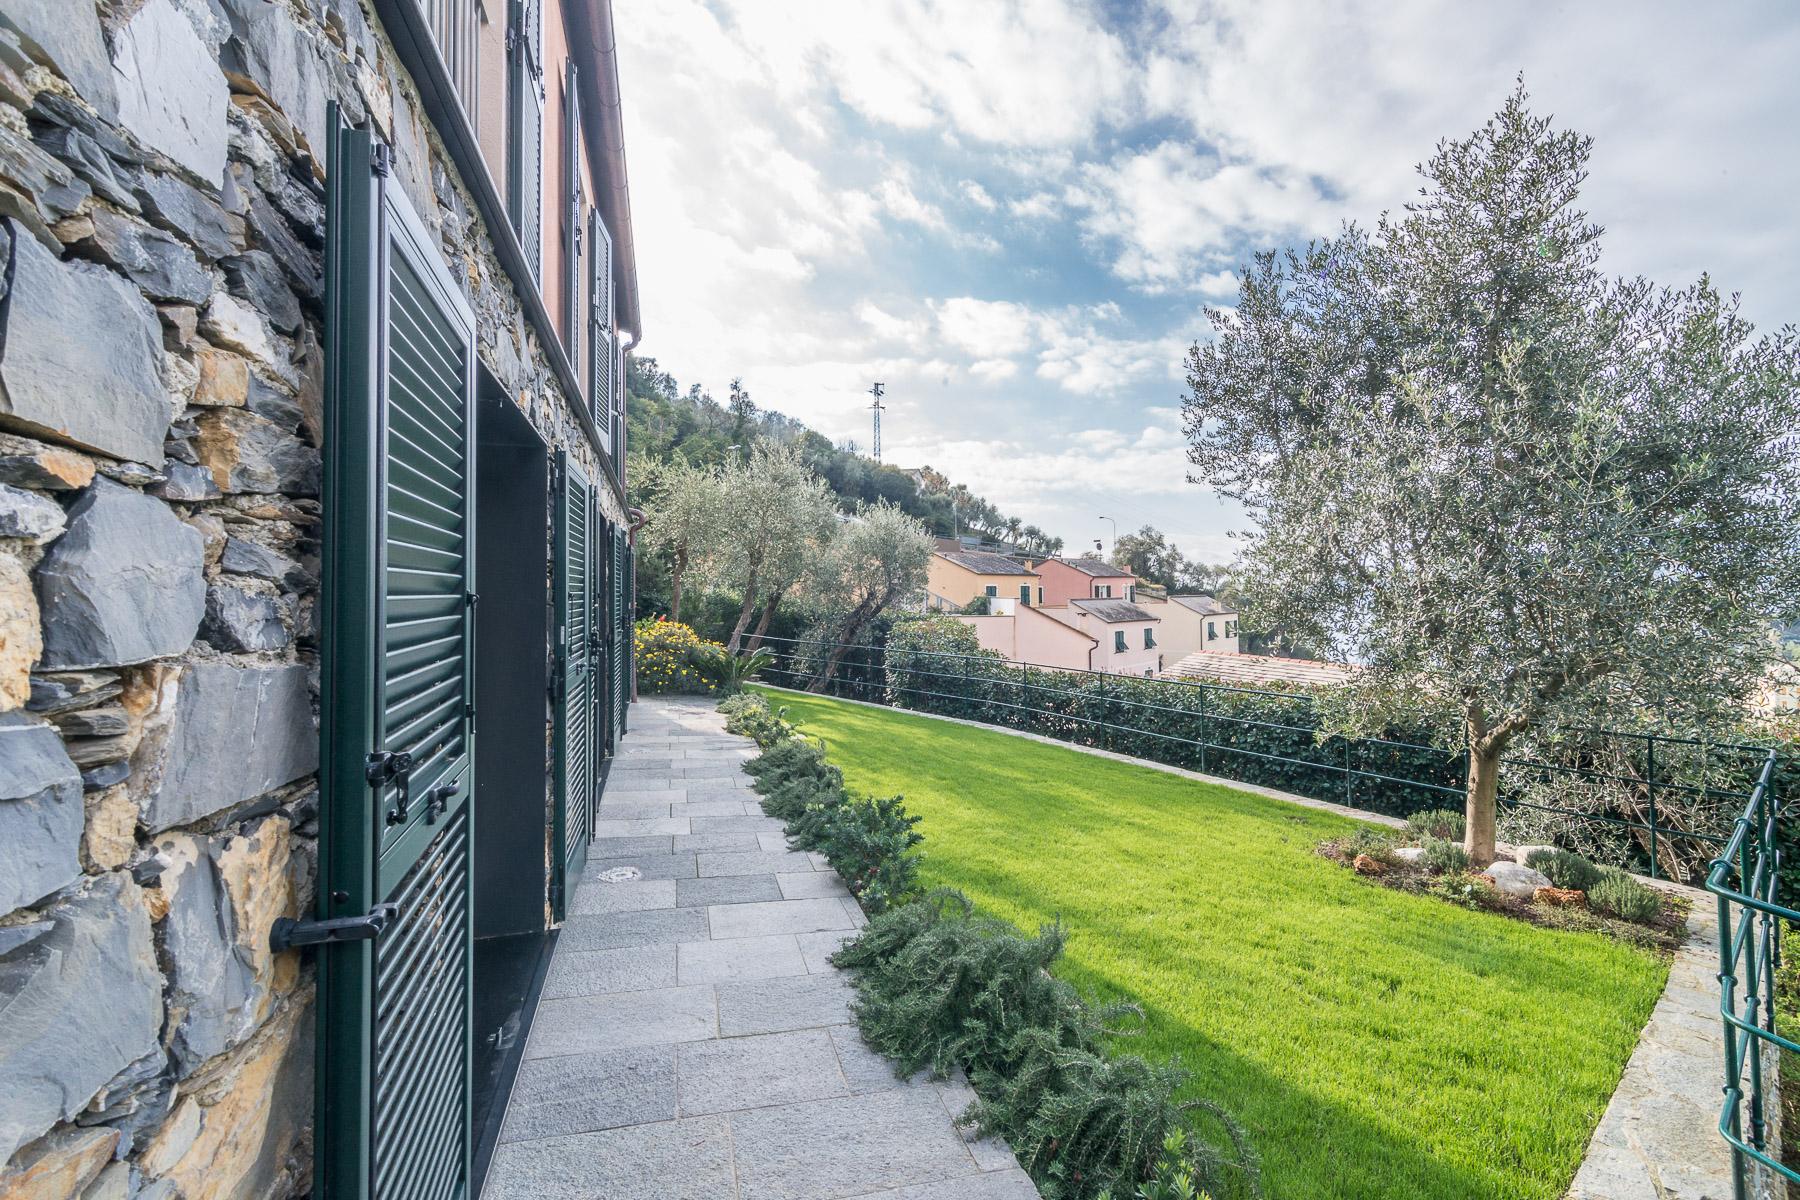 Additional photo for property listing at Charming villa with views on the Italian Riviera Via Solari e Queirolo Zoagli, Genoa 16035 Italy